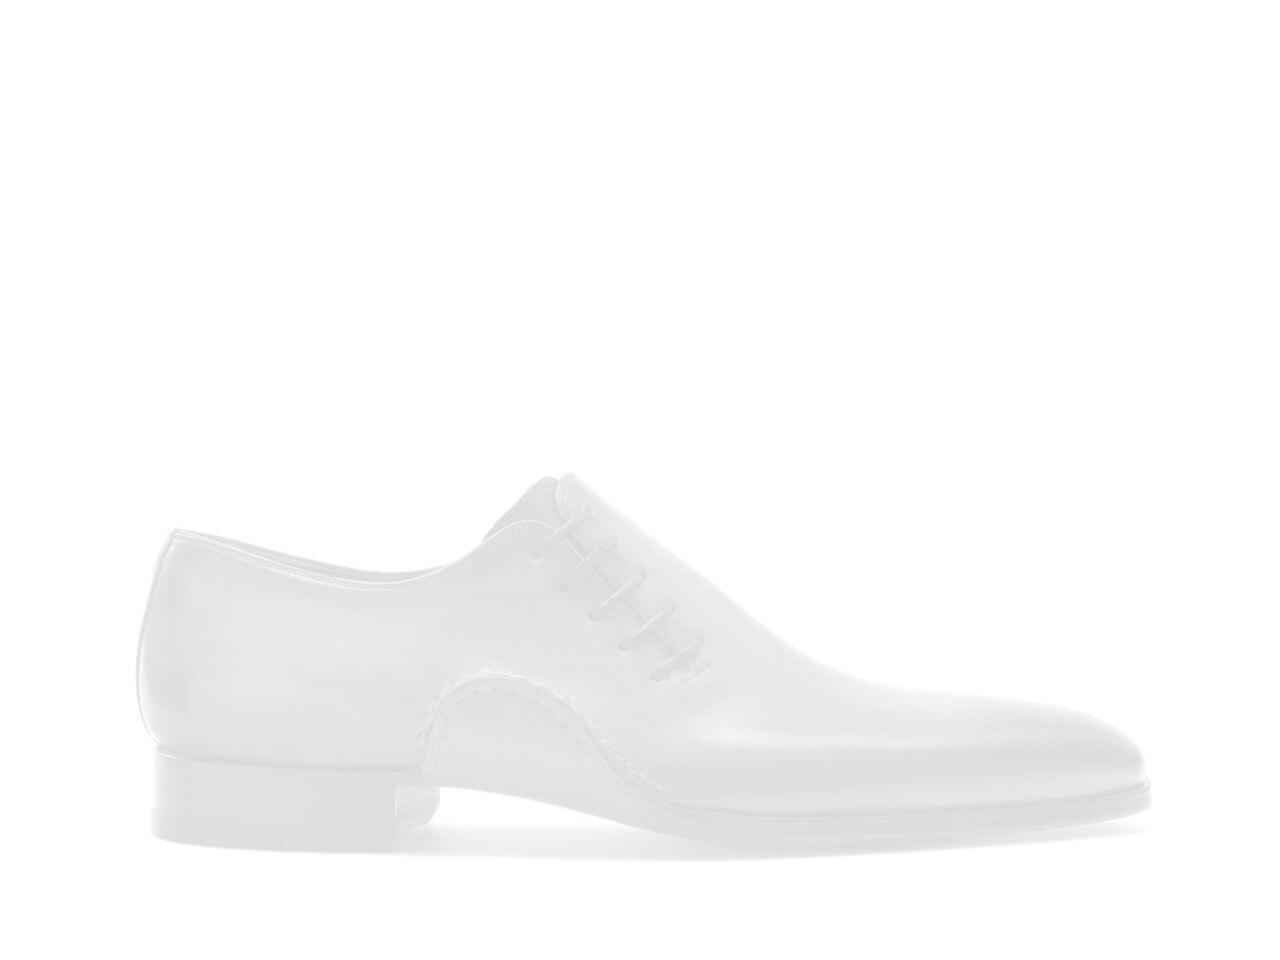 Side view of the Magnanni Magnanni X Pelotonia Men Men's Sneakers